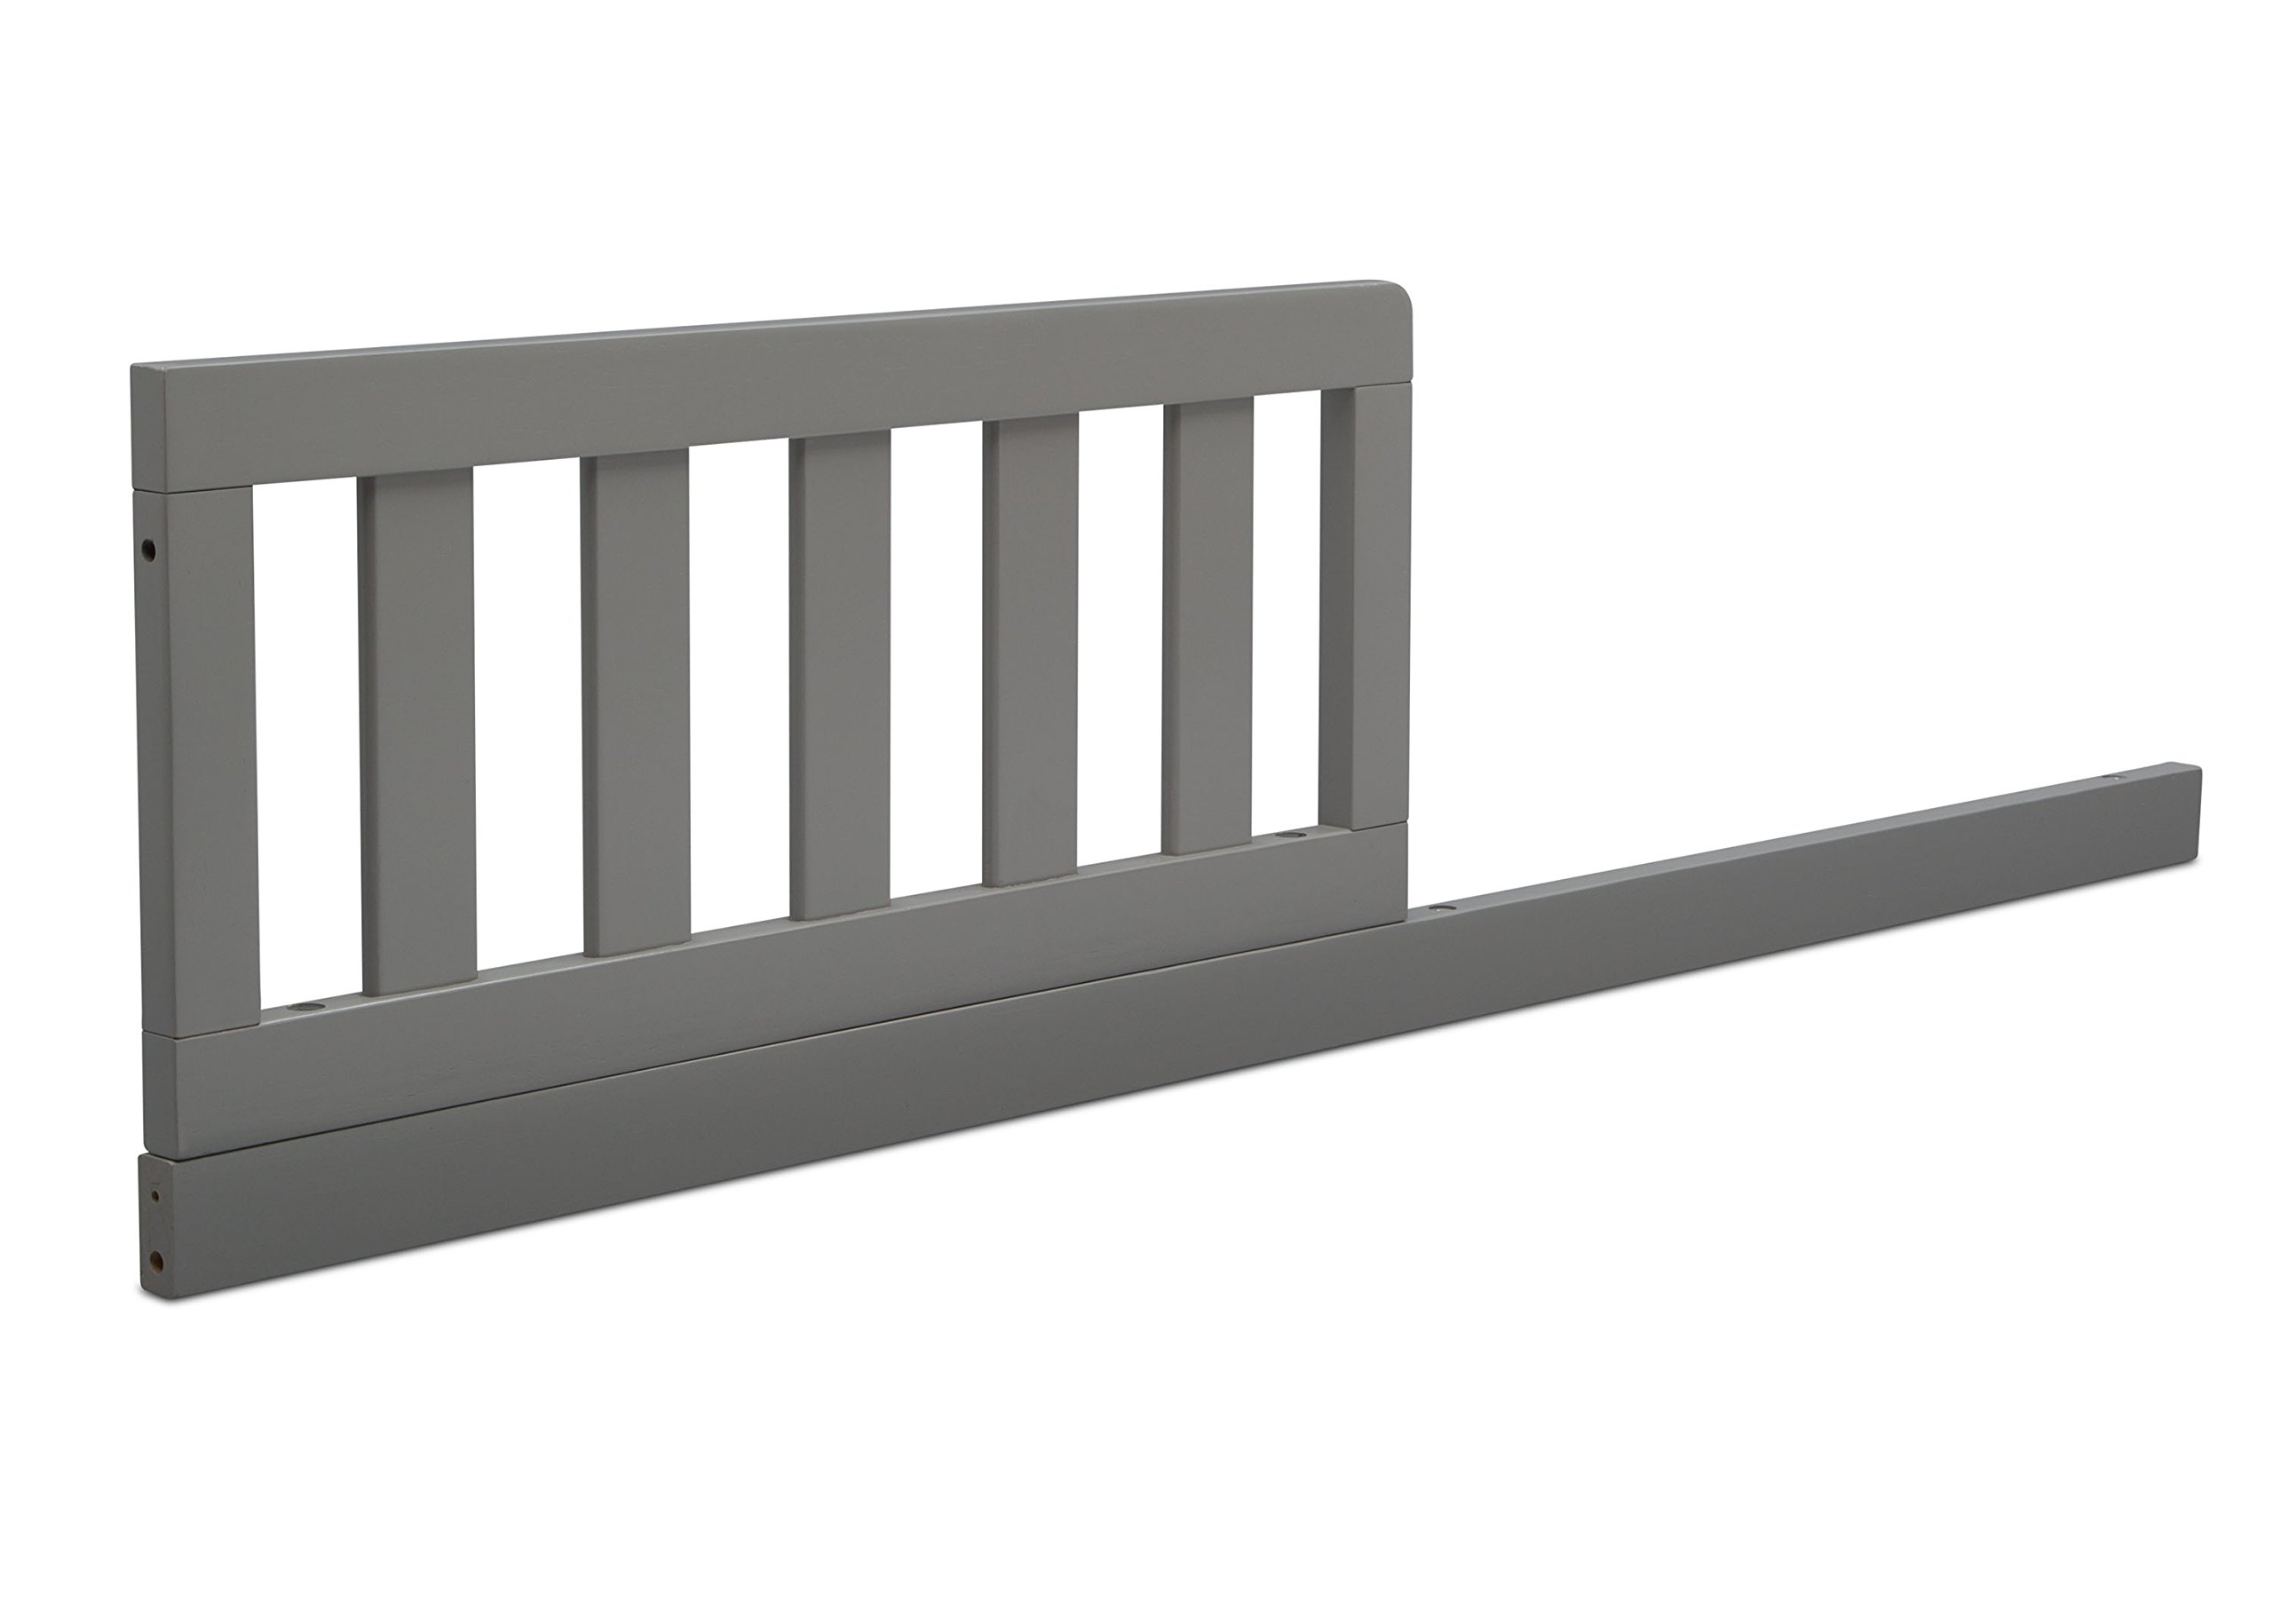 Serta Daybed/Toddler Guardrail Kit #707725, Grey